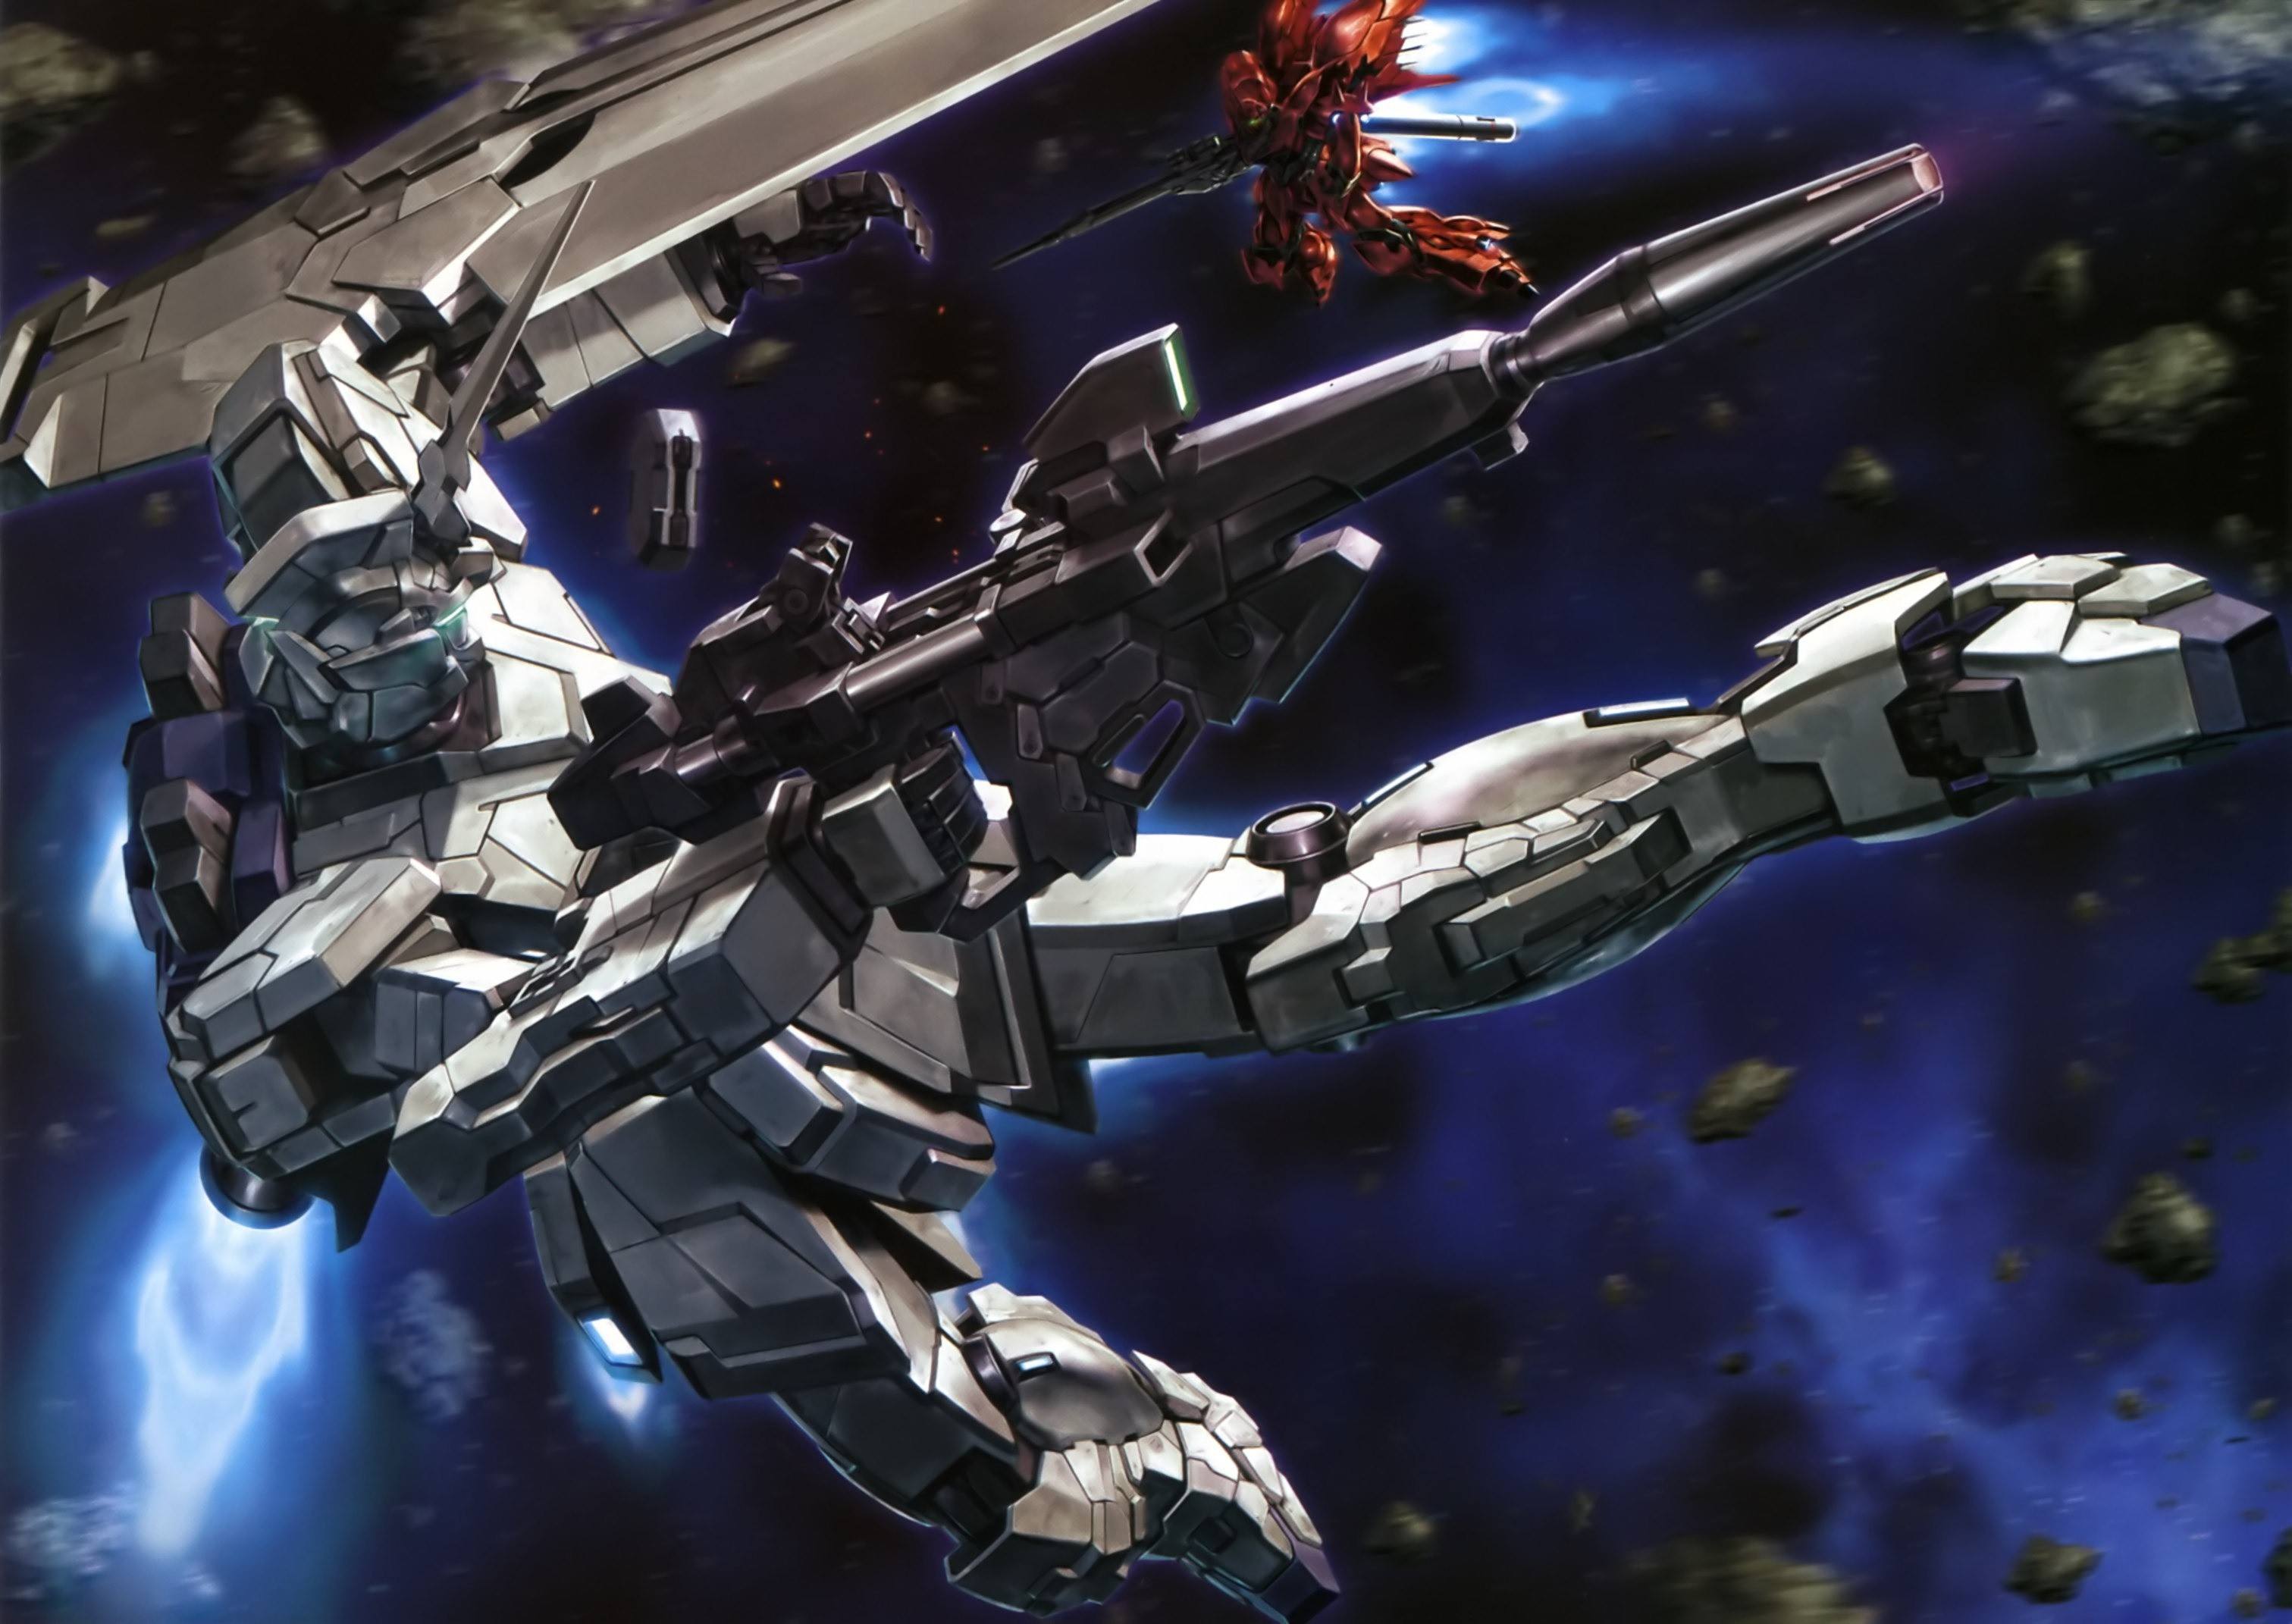 Gundam wing wallpaper hd 58 images - Gundam wallpaper hd ...